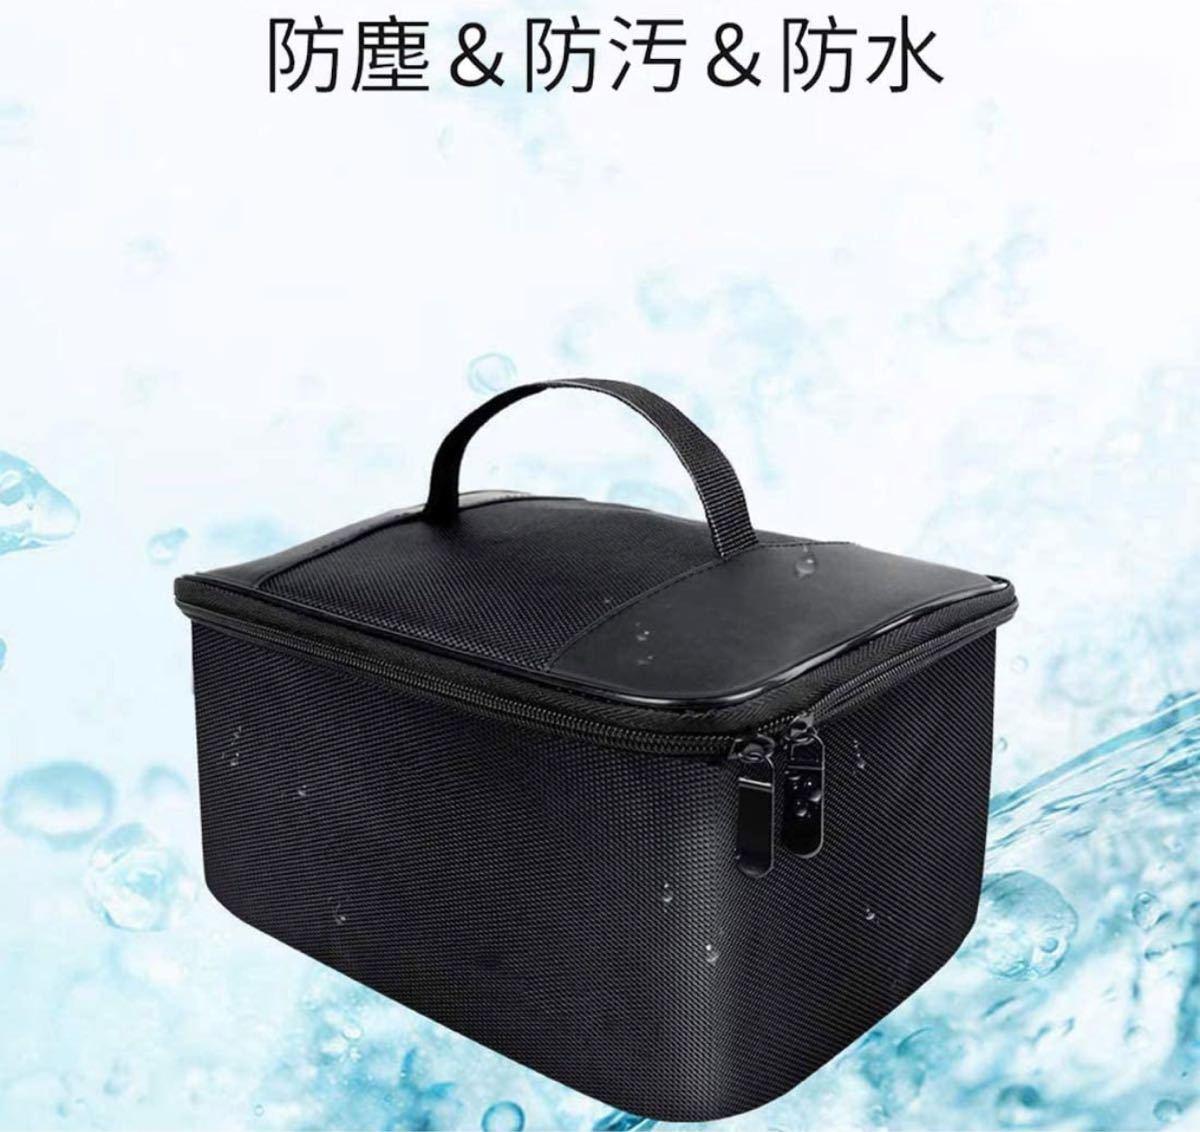 Switch専用収納バッグ Chayoo ニンテンドースイッチ専用収納ケース 素材 全面保護型 ゲームカード 8個収納可